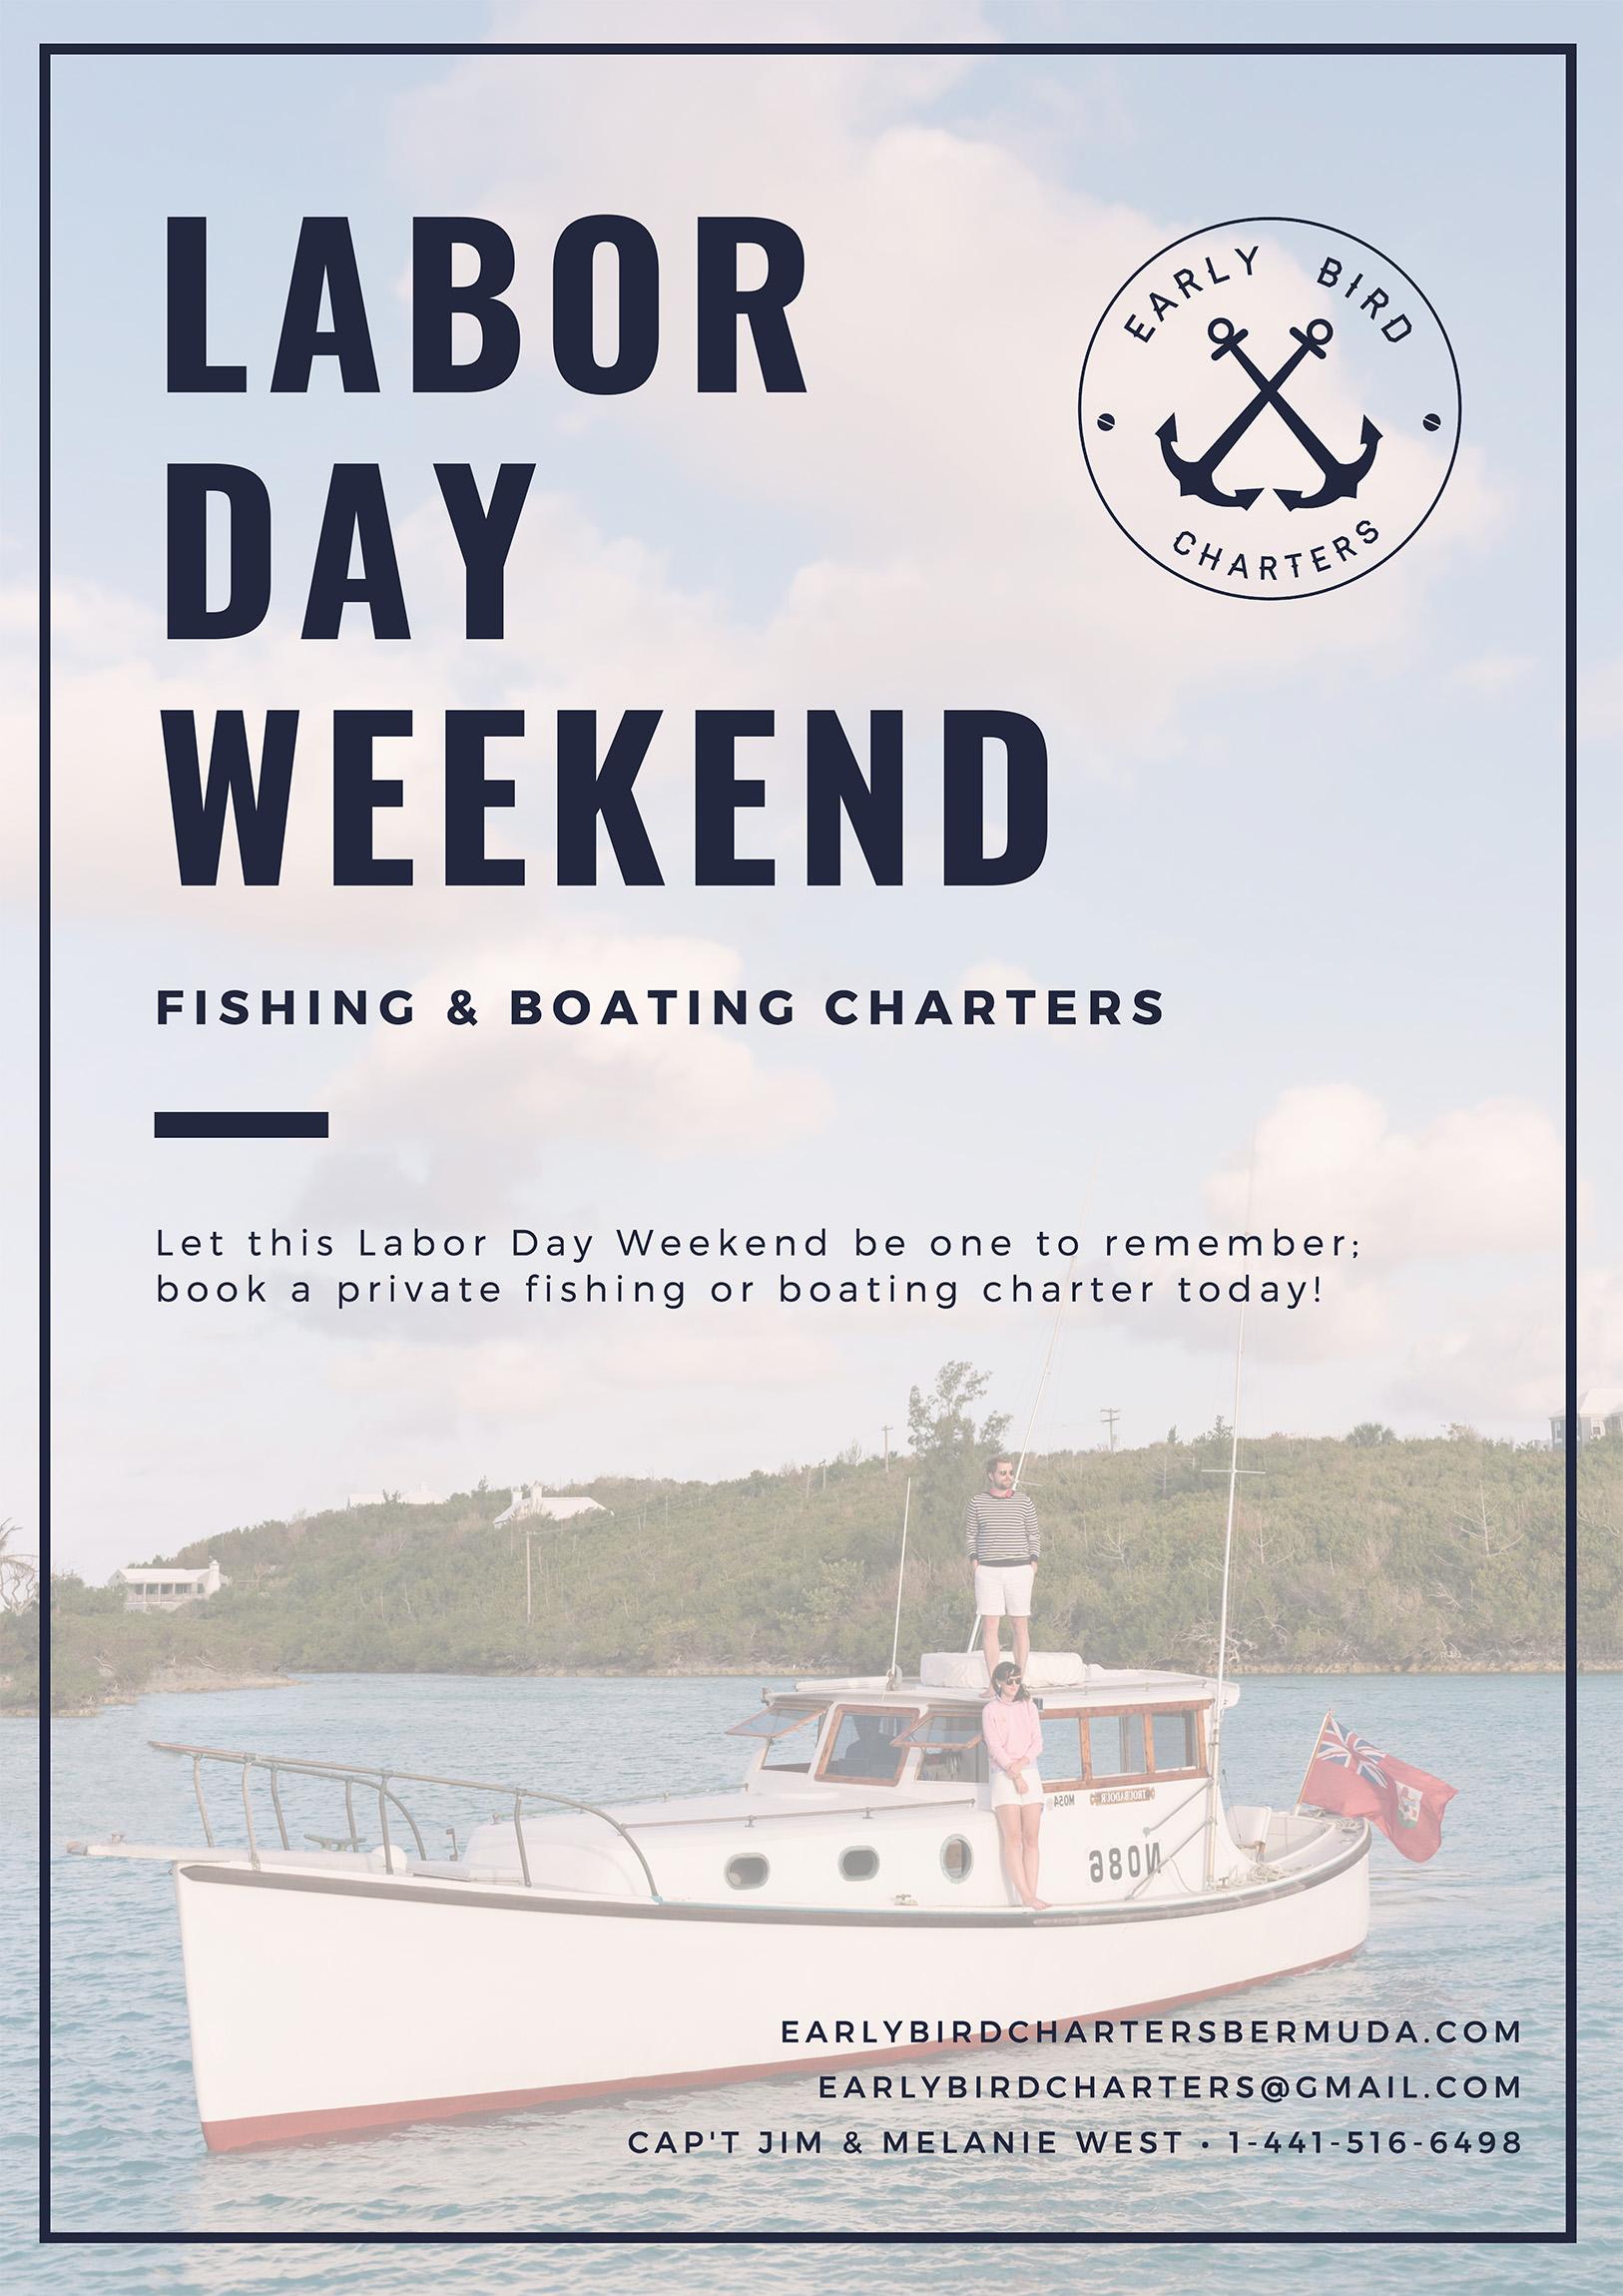 Early Bird Charters_Bermuda Fishing_Boating.jpg